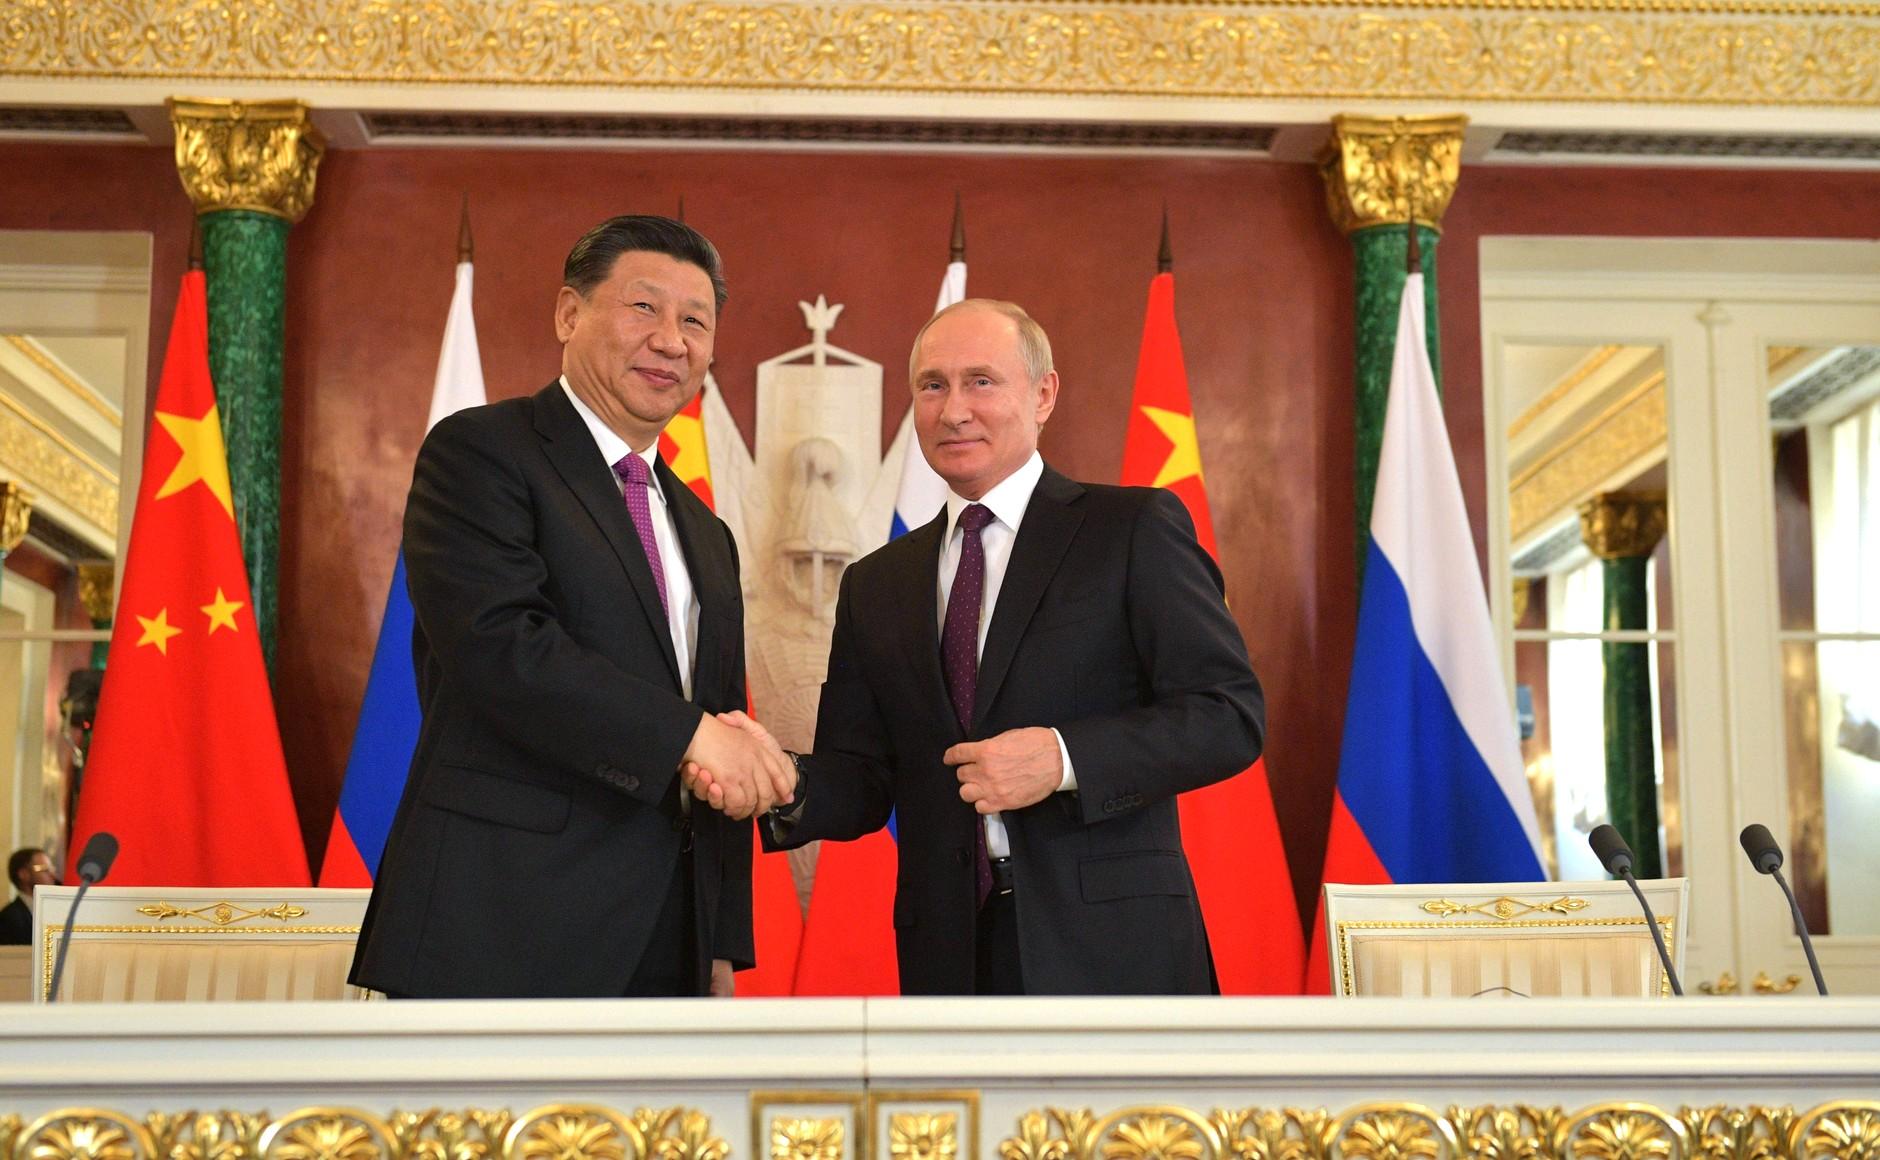 File:Vladimir Putin and Xi Jinping (2019-06-05) 45.jpg - Wikimedia Commons